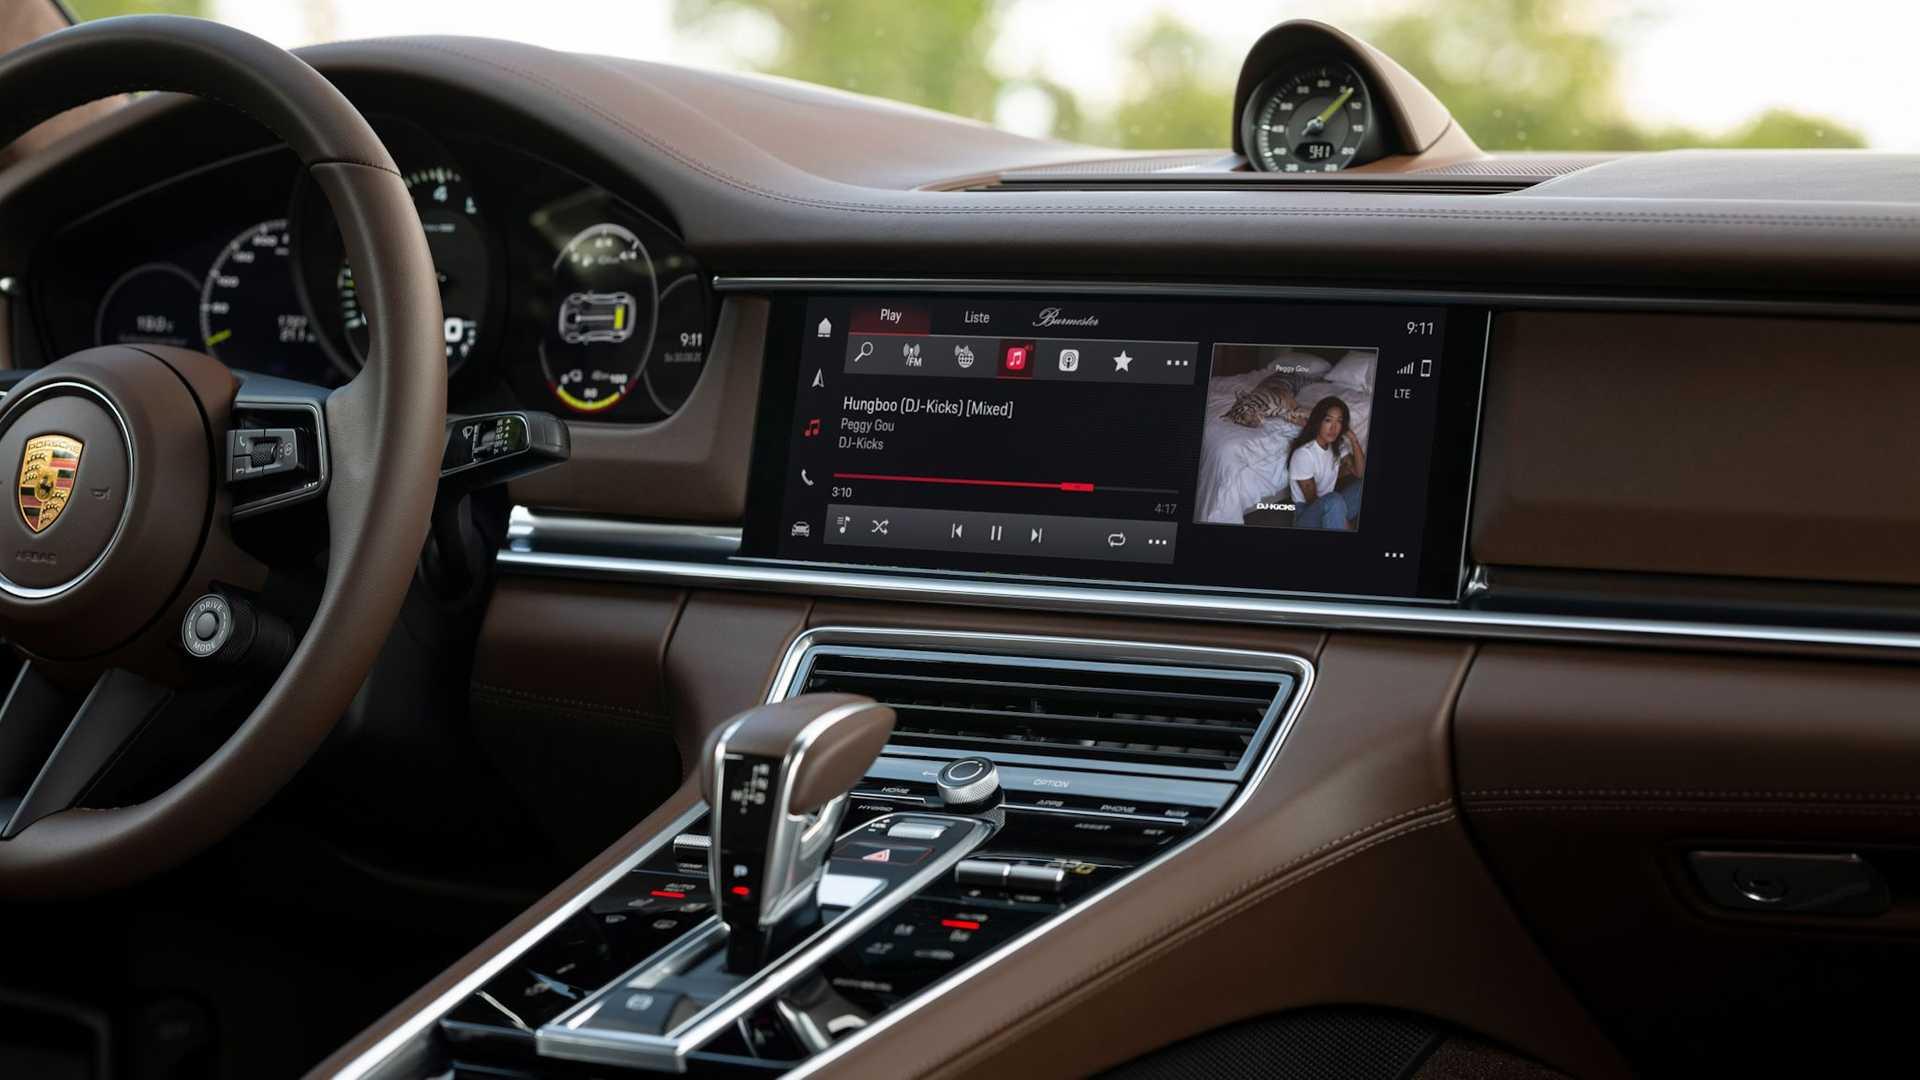 Porsche-Communication-Management-6-27